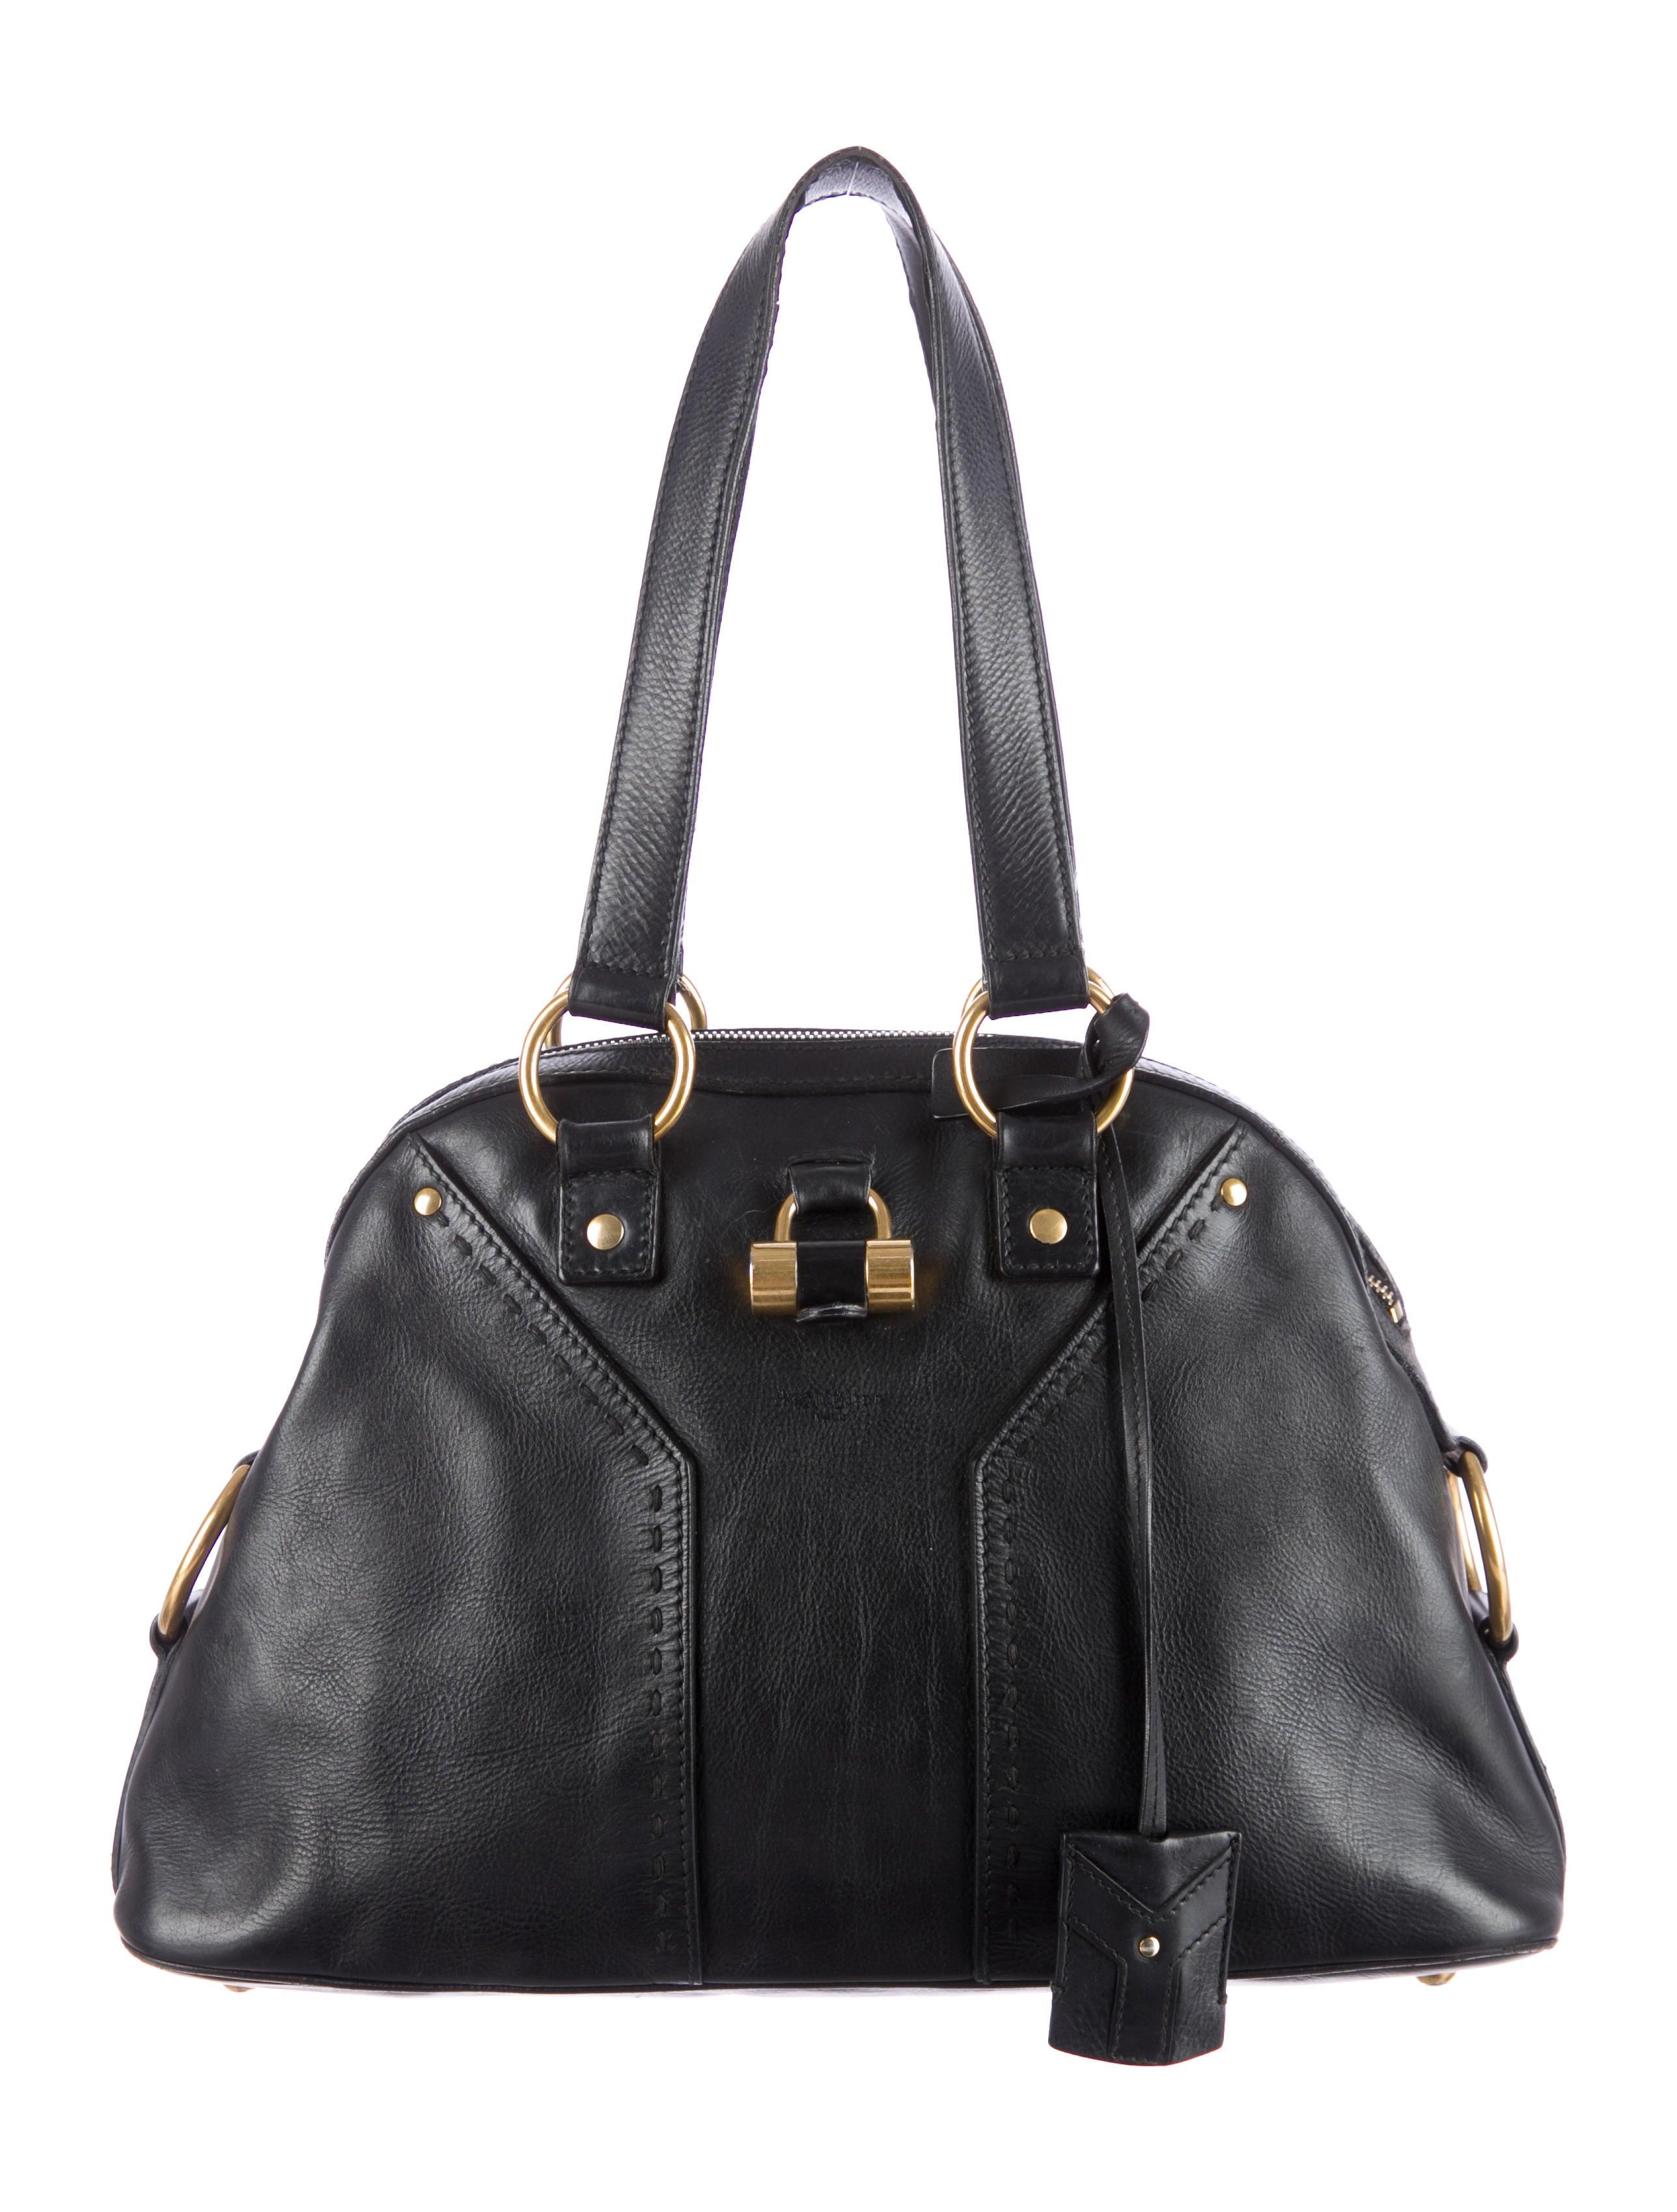 yves saint laurent handbags uk